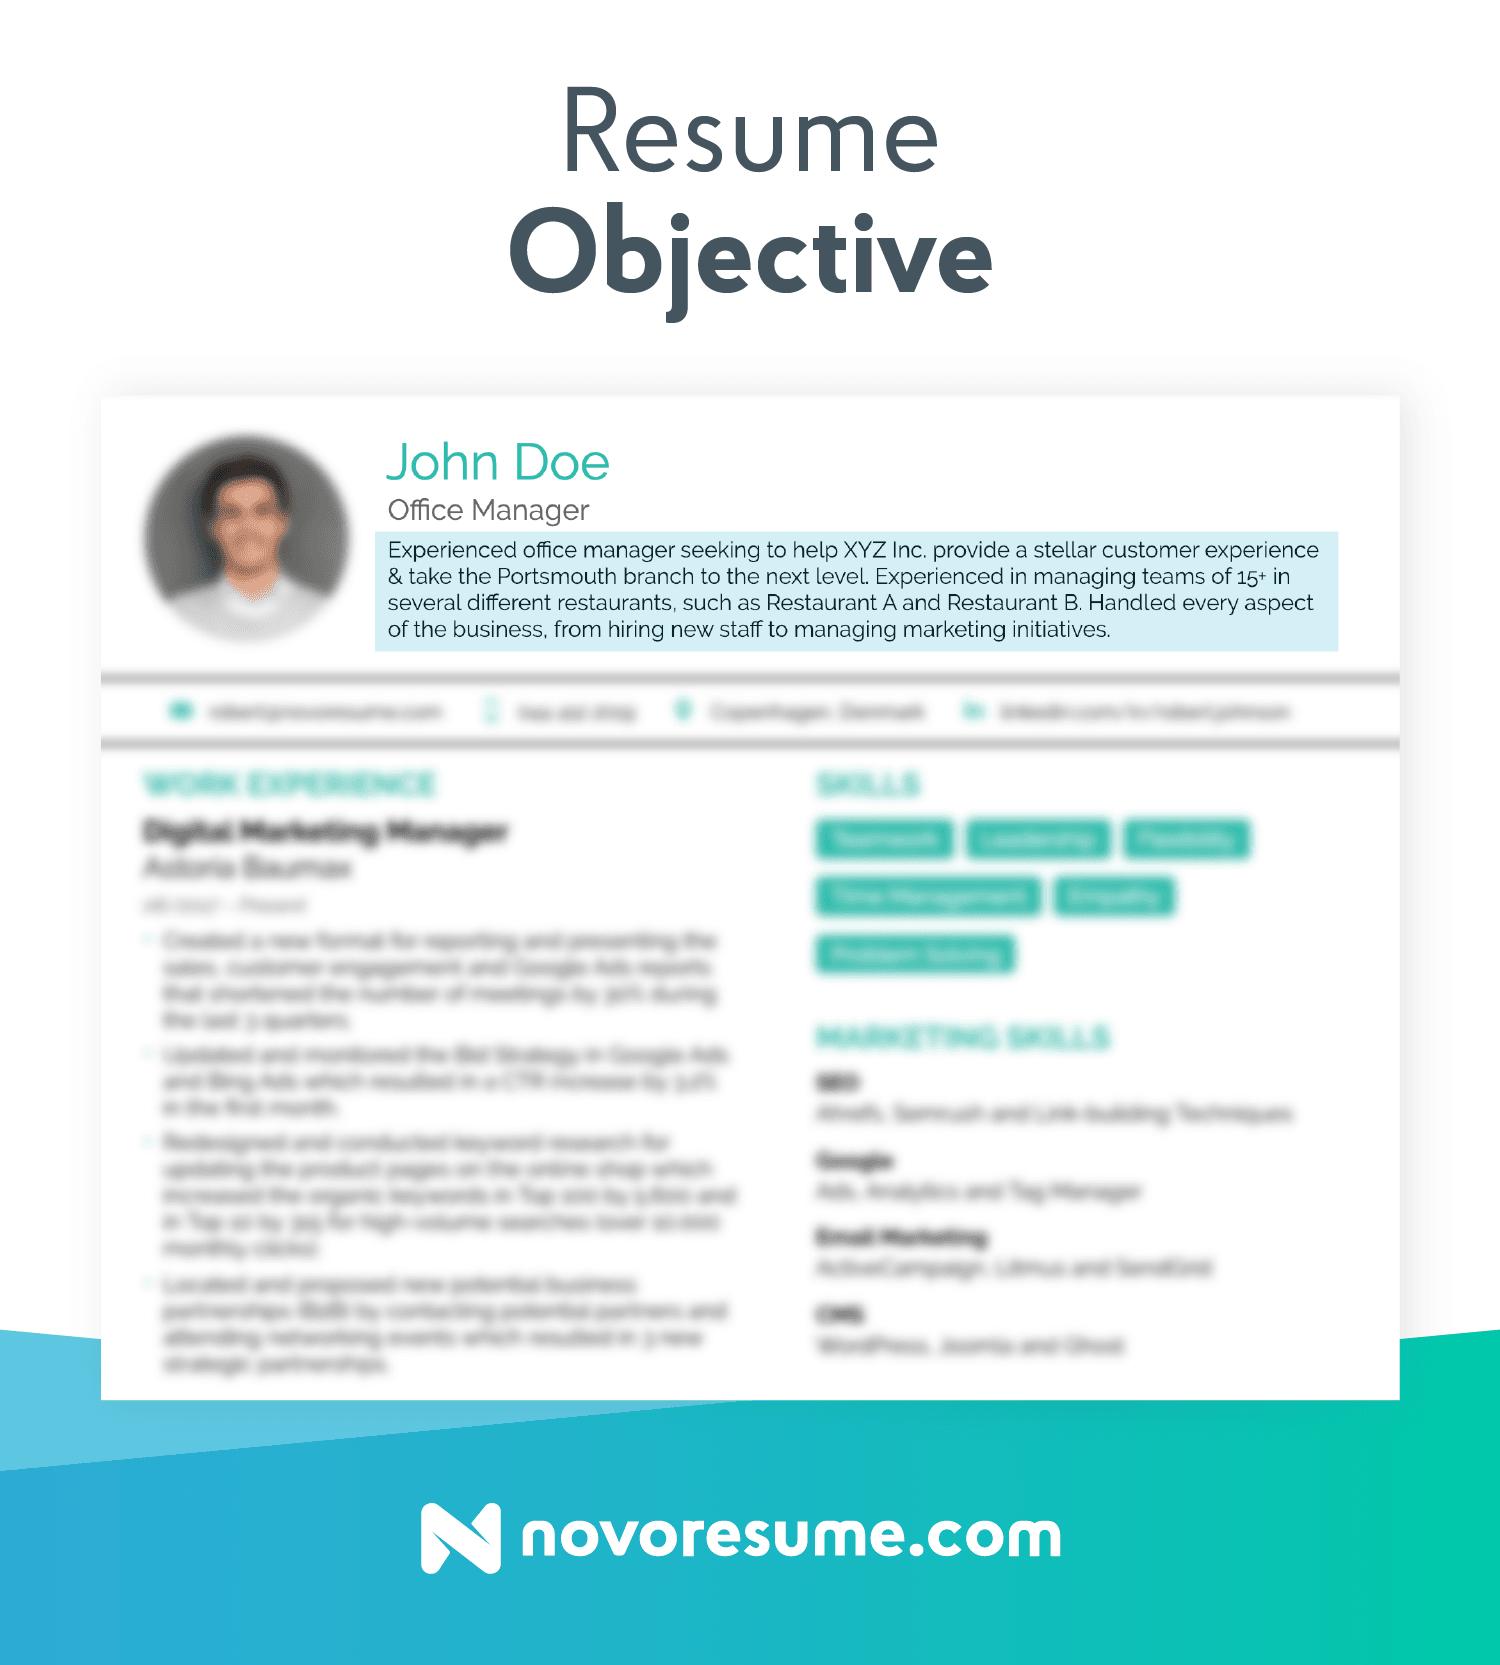 Objective On A Resume Resume Objective objective on a resume|wikiresume.com